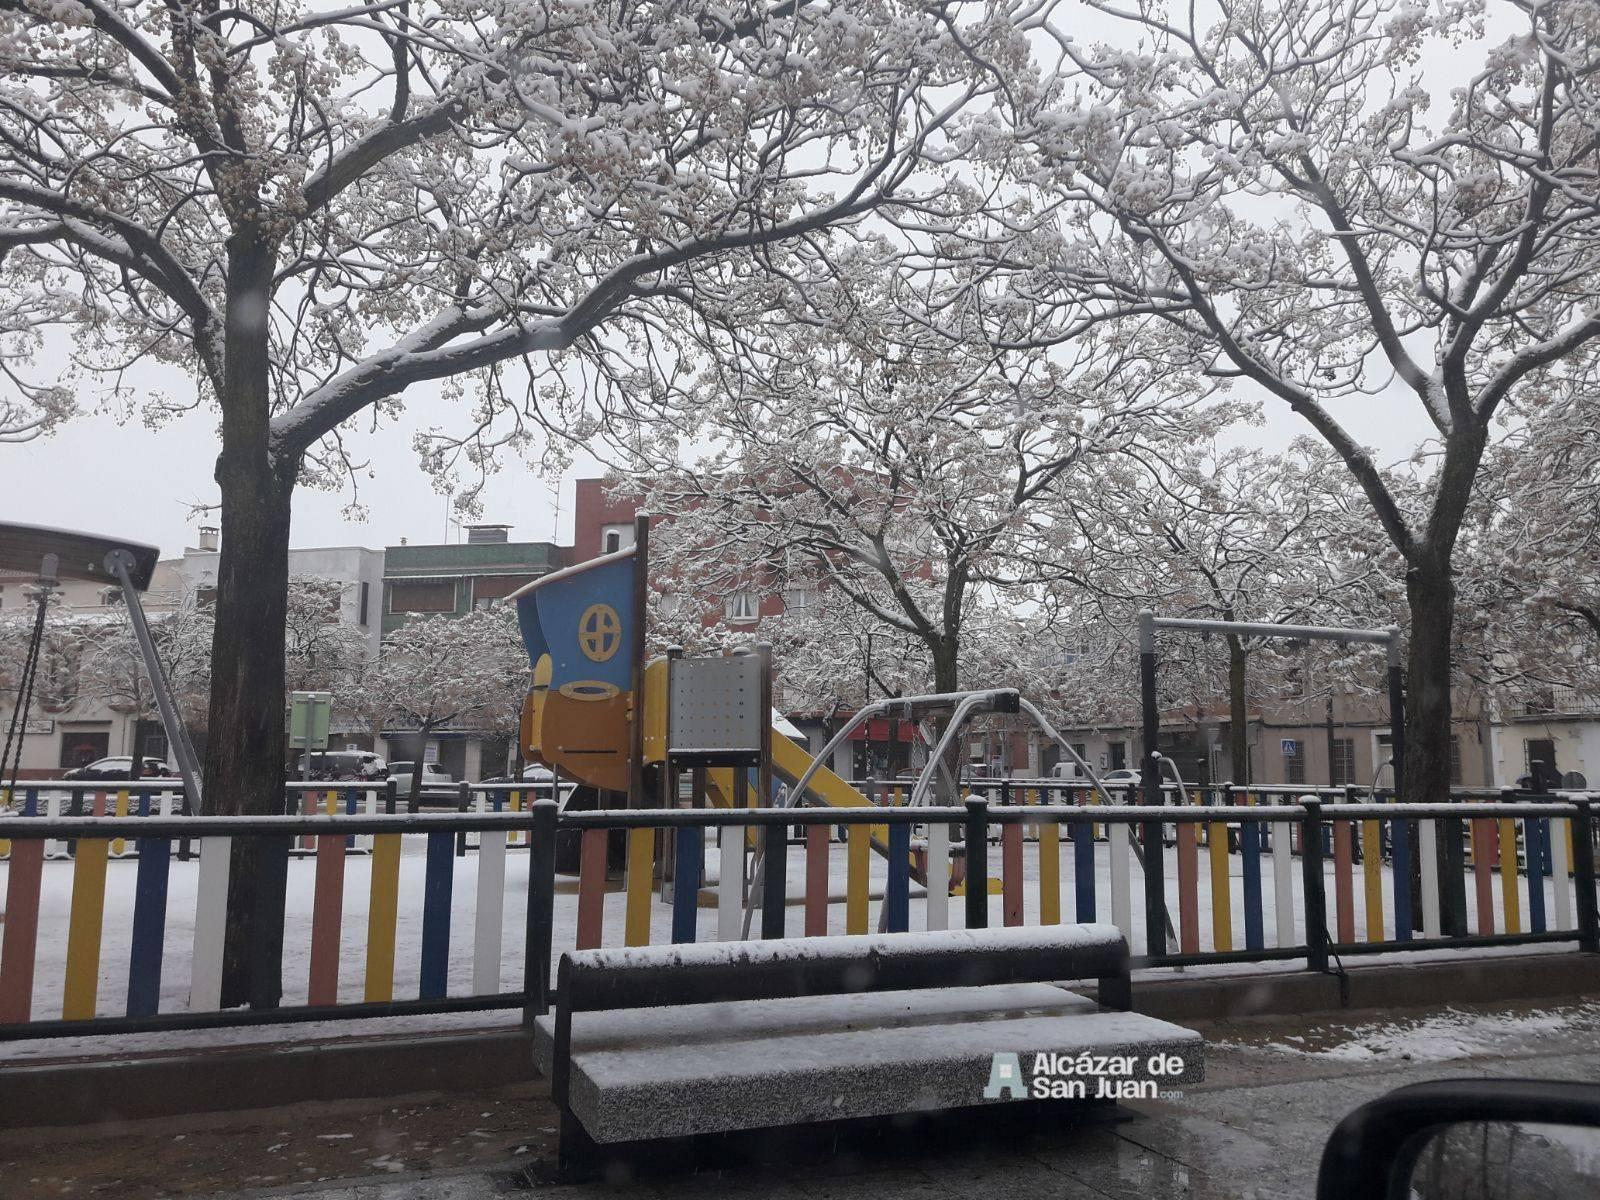 alcazar-calles-nieve-4 1